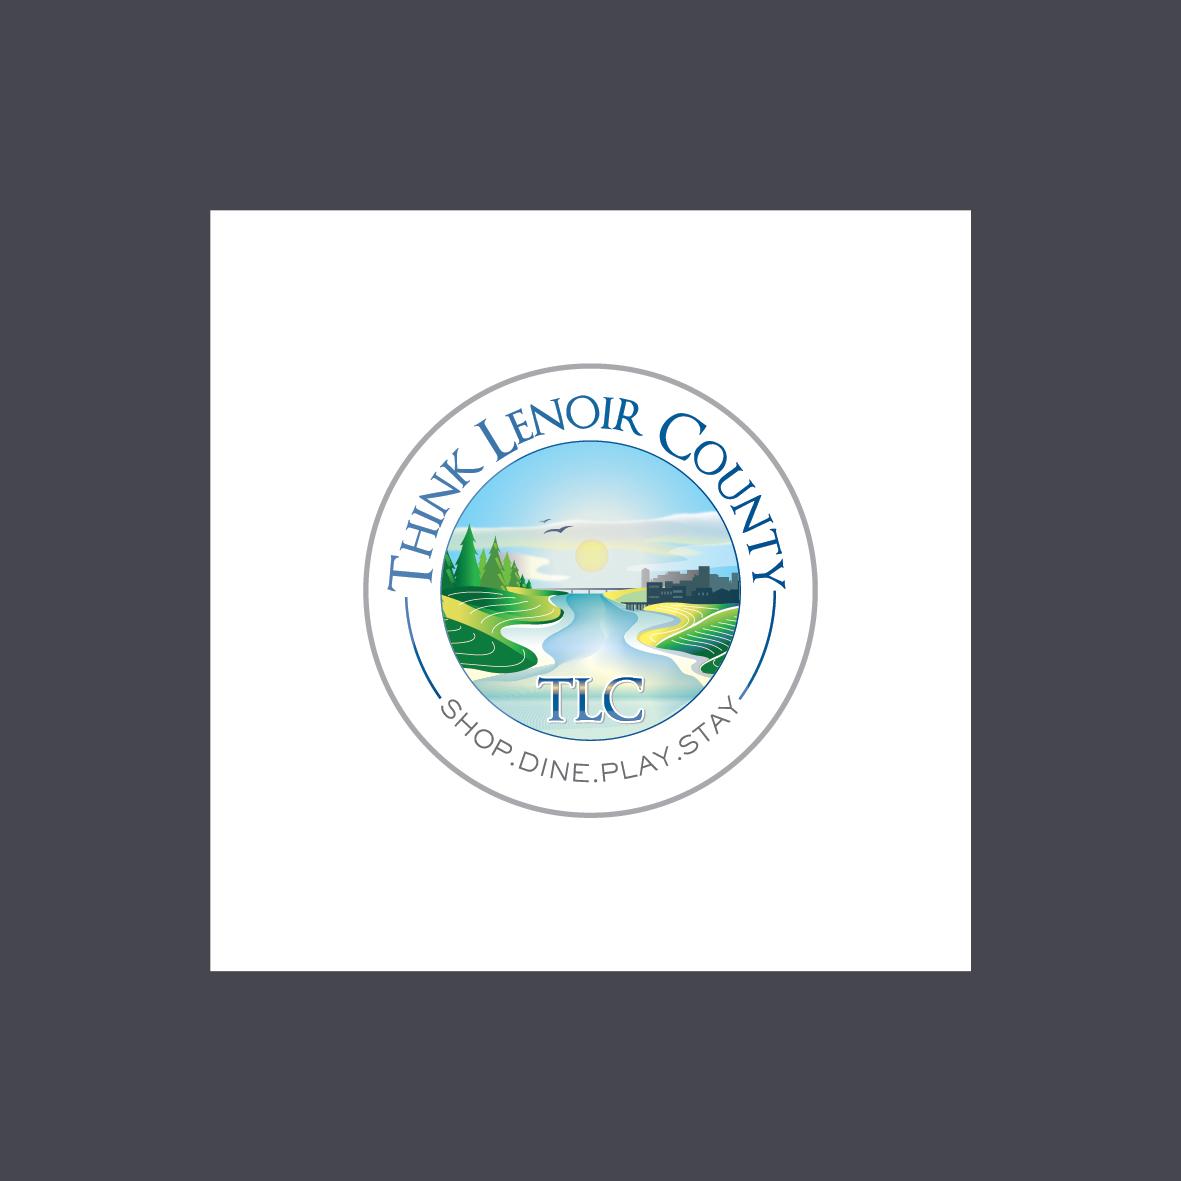 think lenoir county logo salvatore ferrara salerno coffeeandesigns